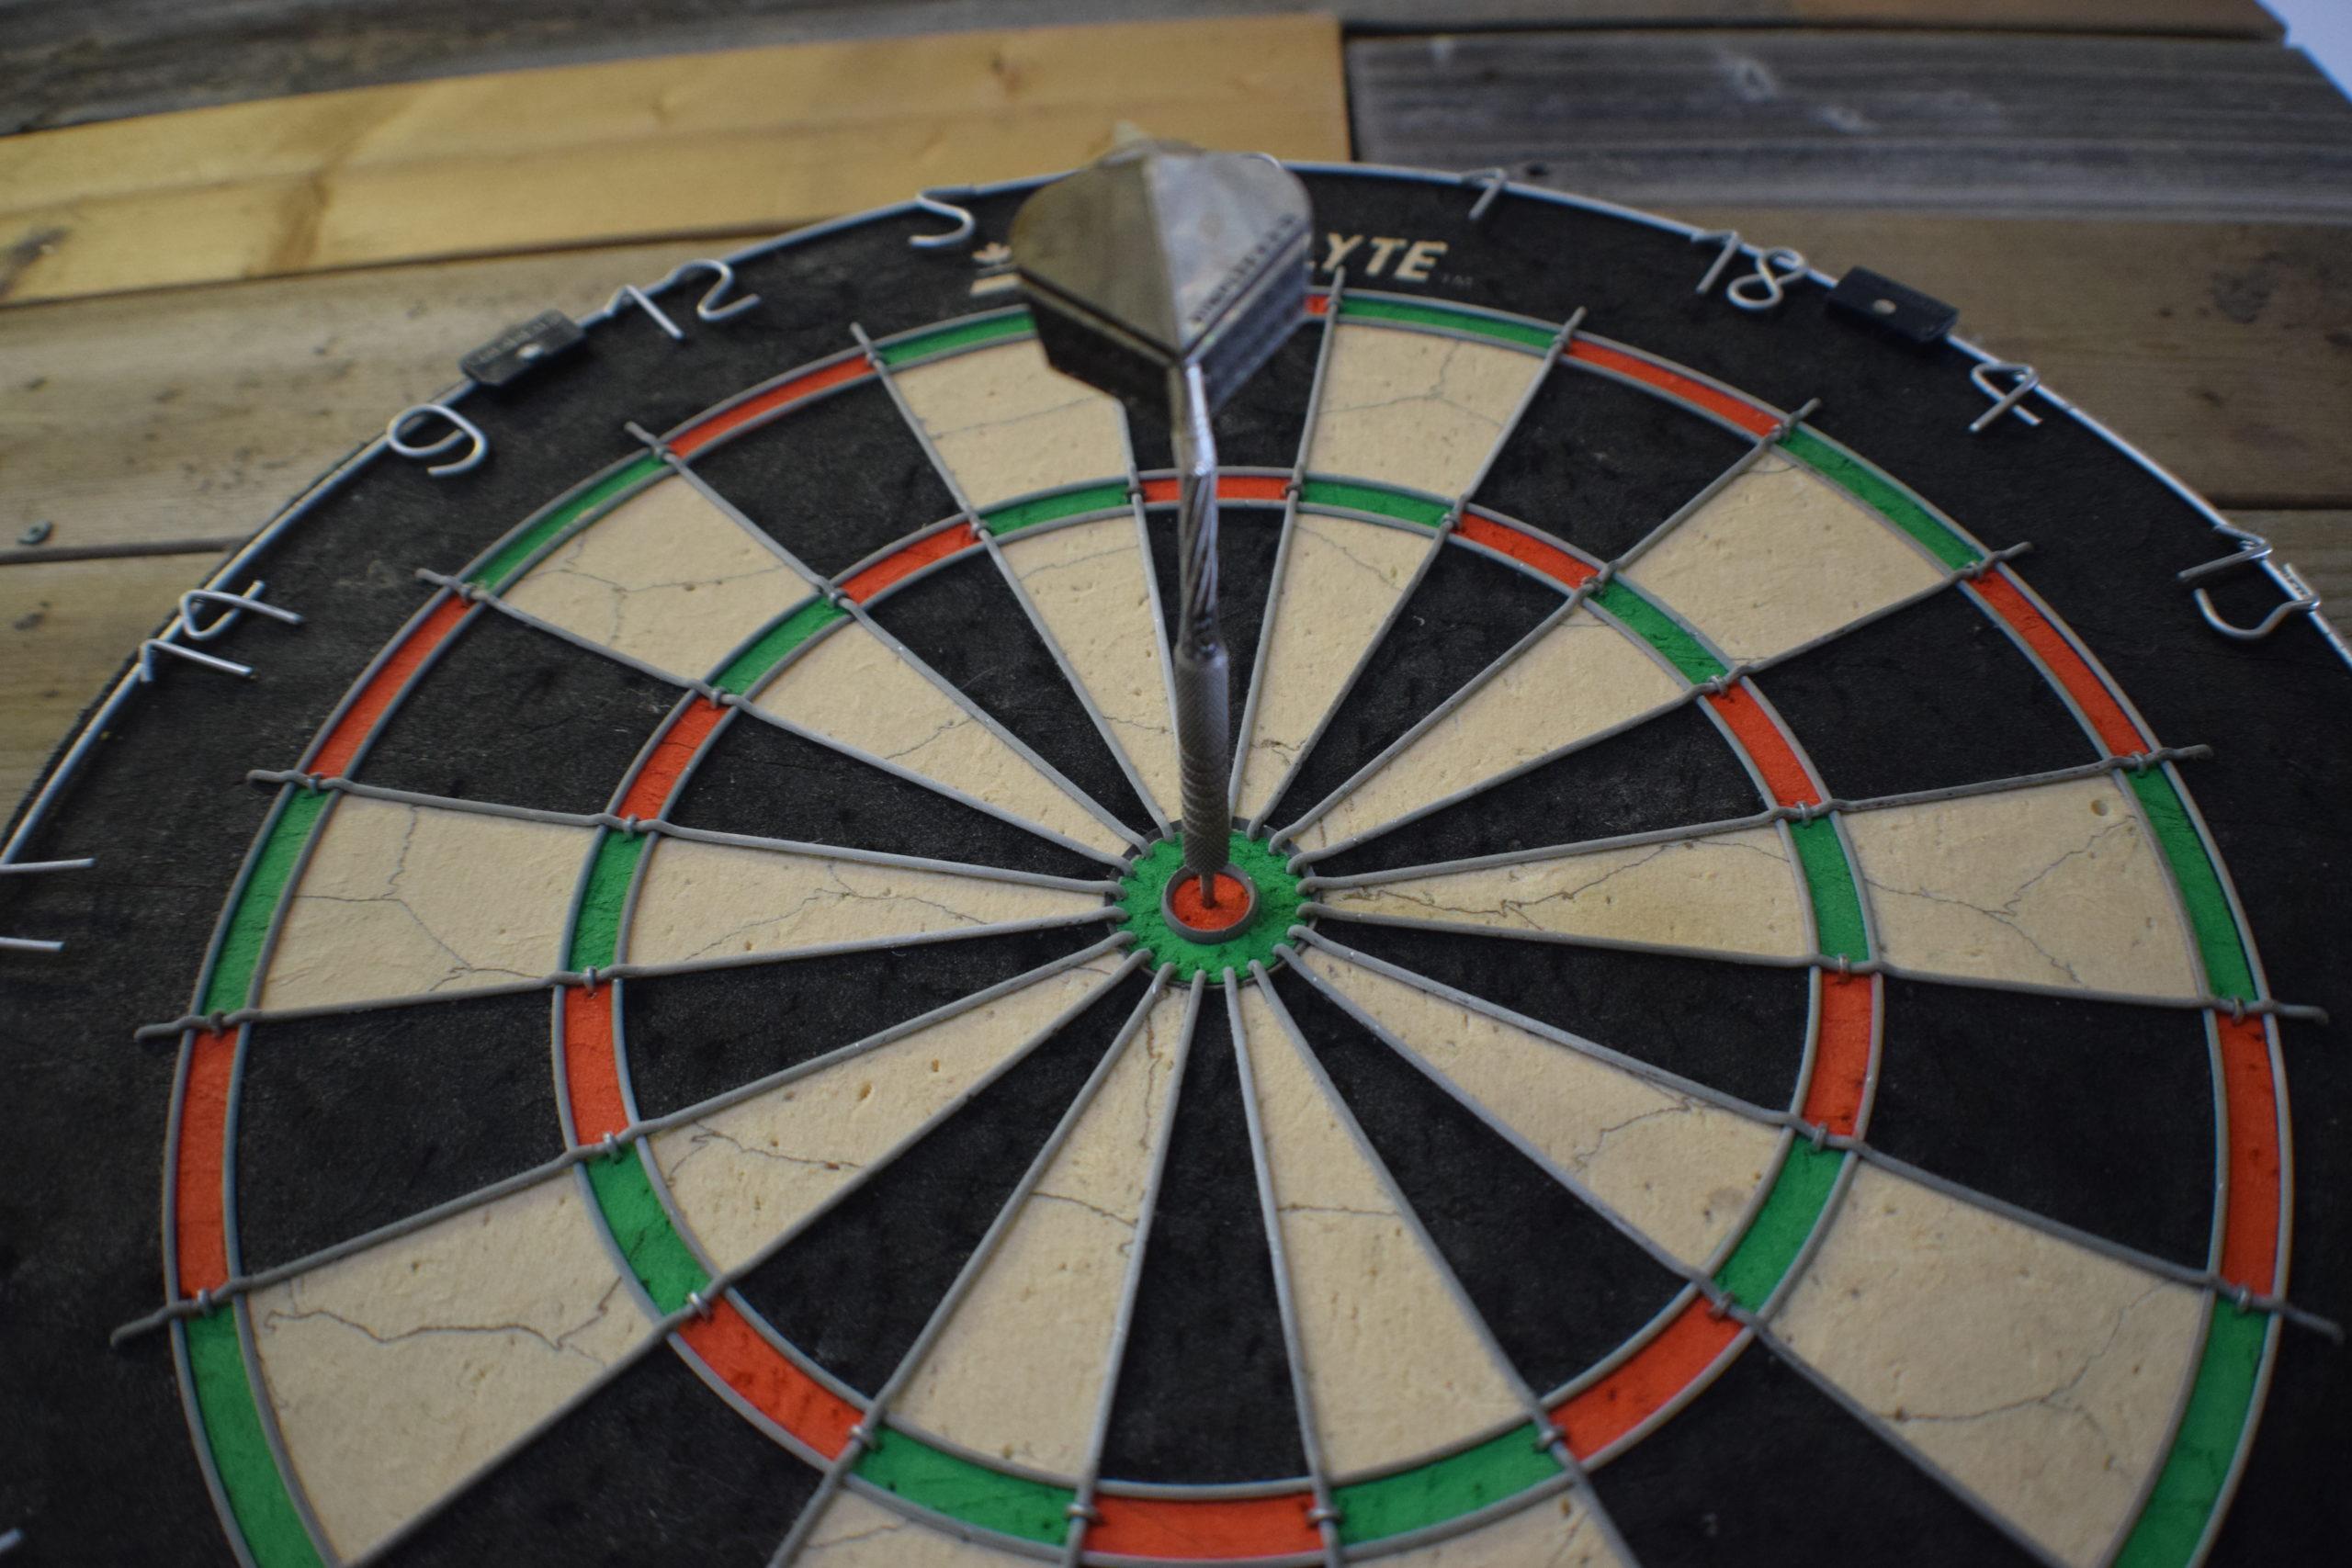 standard dartbaord on wood wall with dart in the bullseye